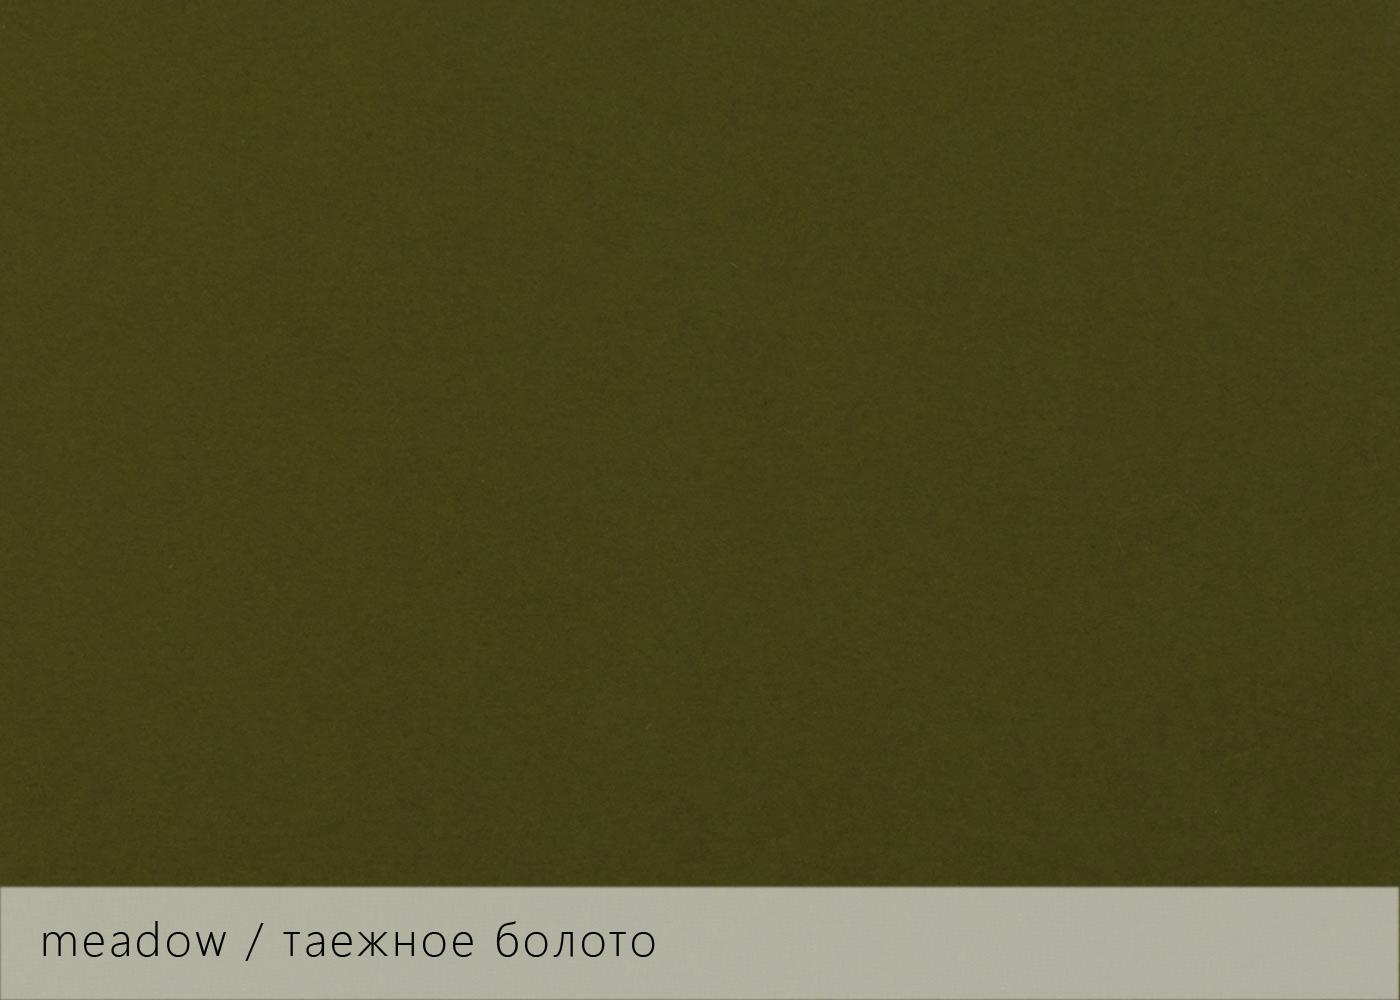 Keaykolour meadow / таежное болото